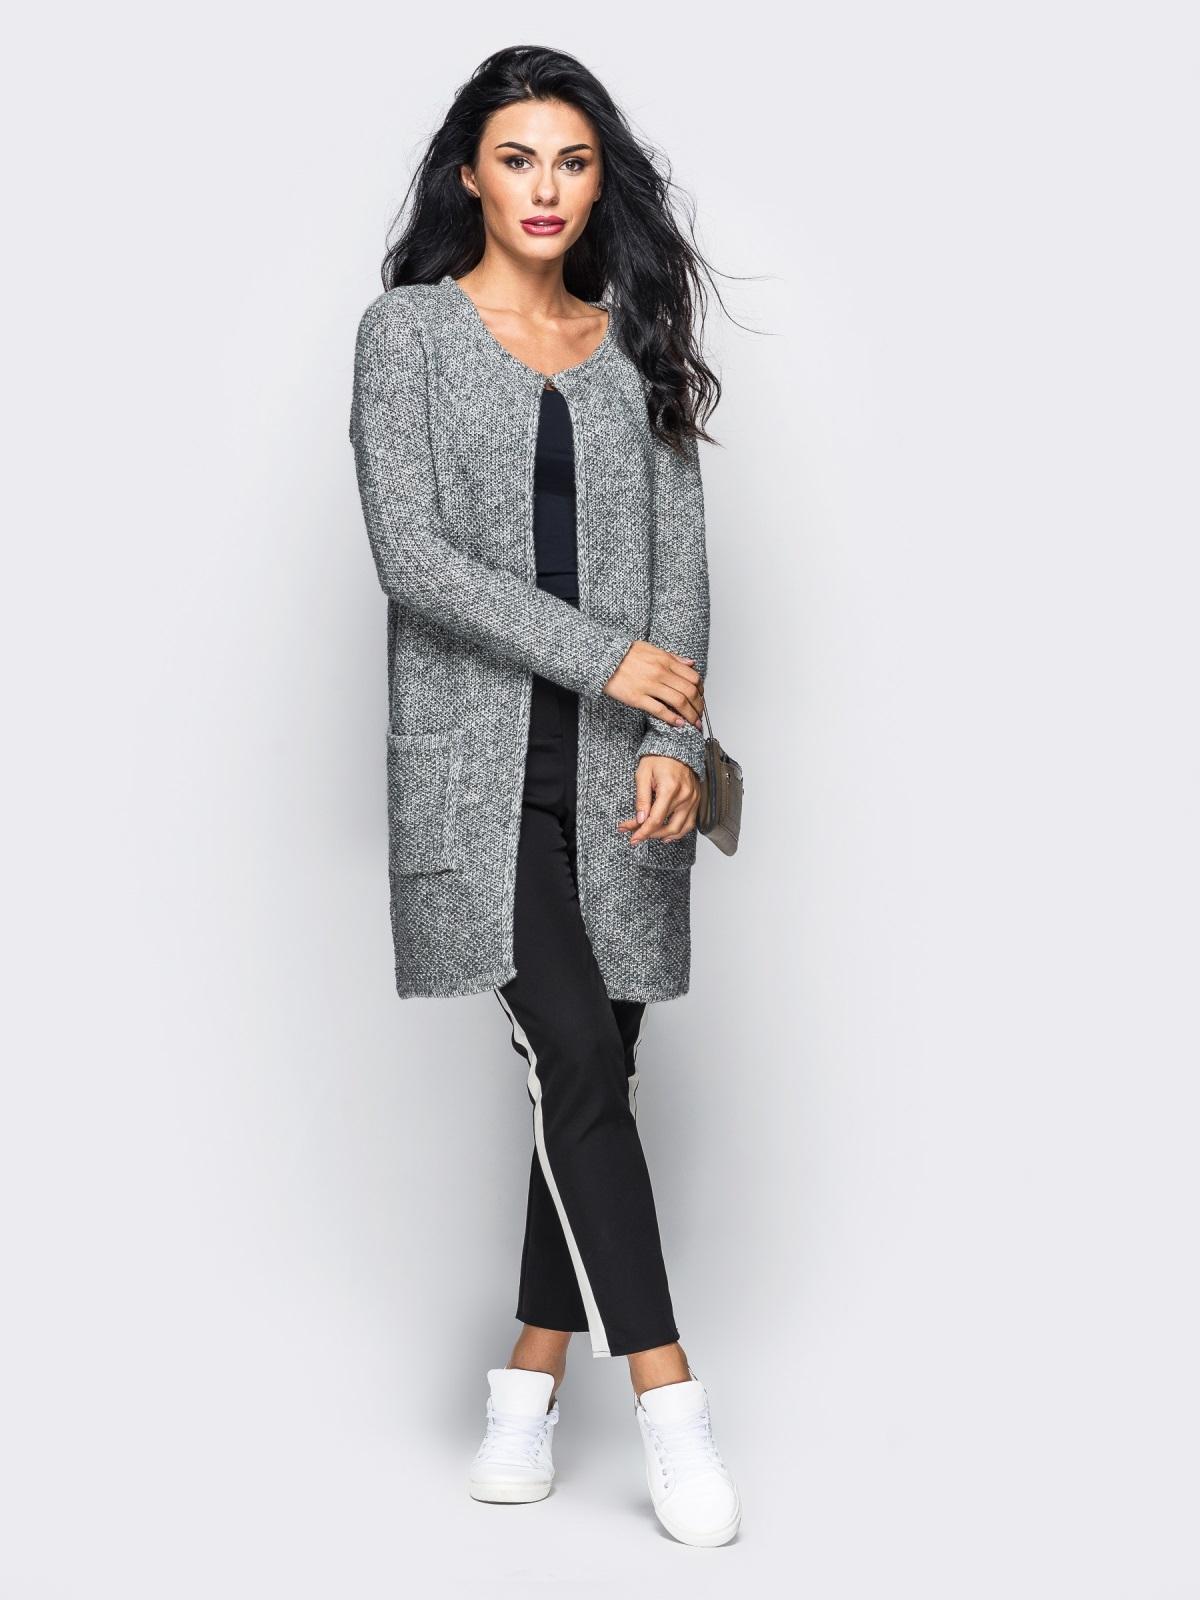 Серый вязаный кардиган с накладными карманами - 10380, фото 1 – интернет-магазин Dressa